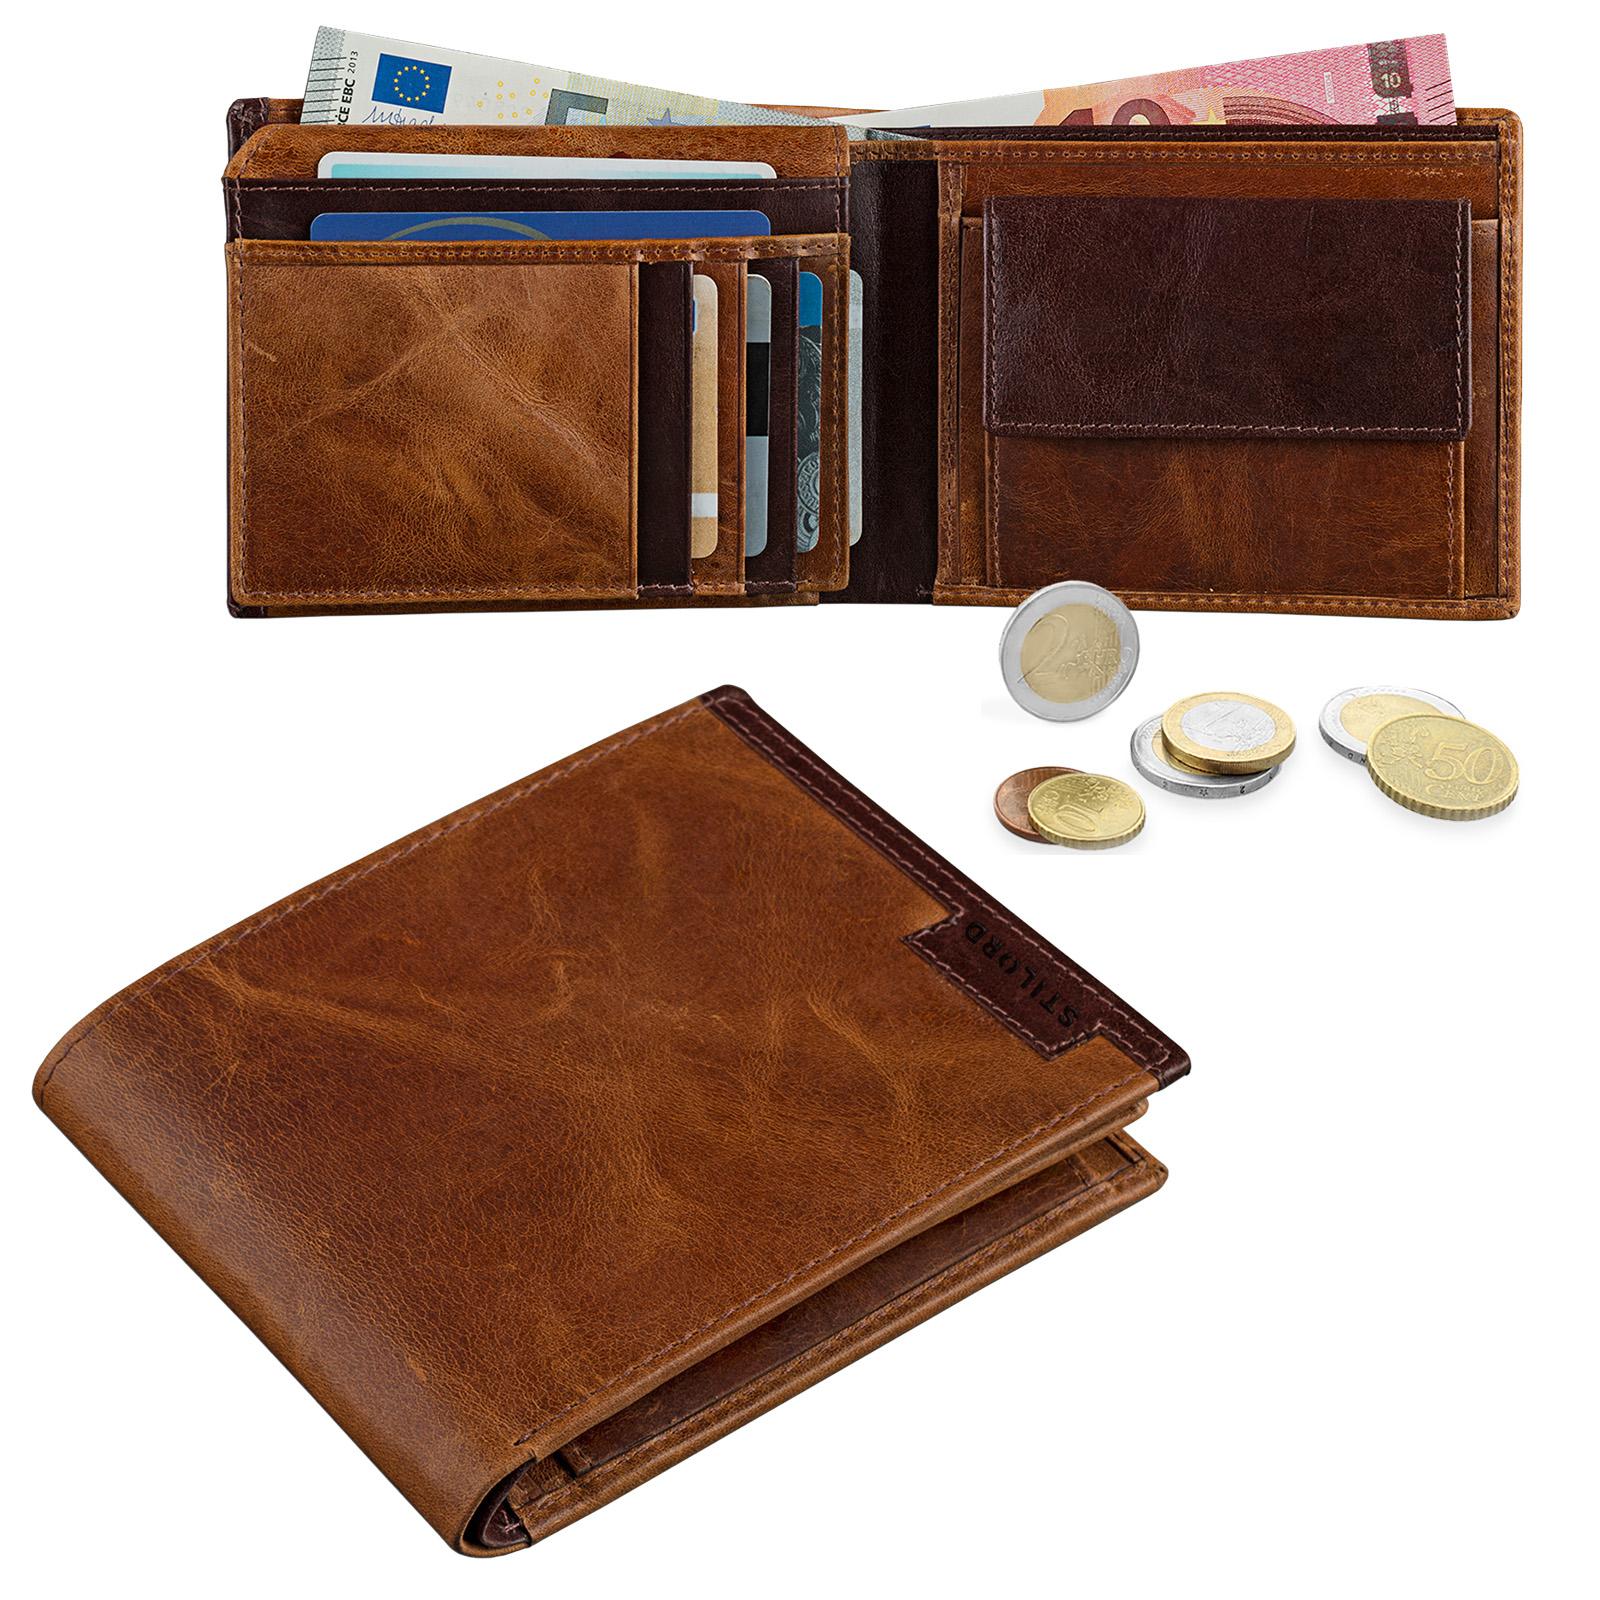 Vintage Herren Portemonnaie Leder braun